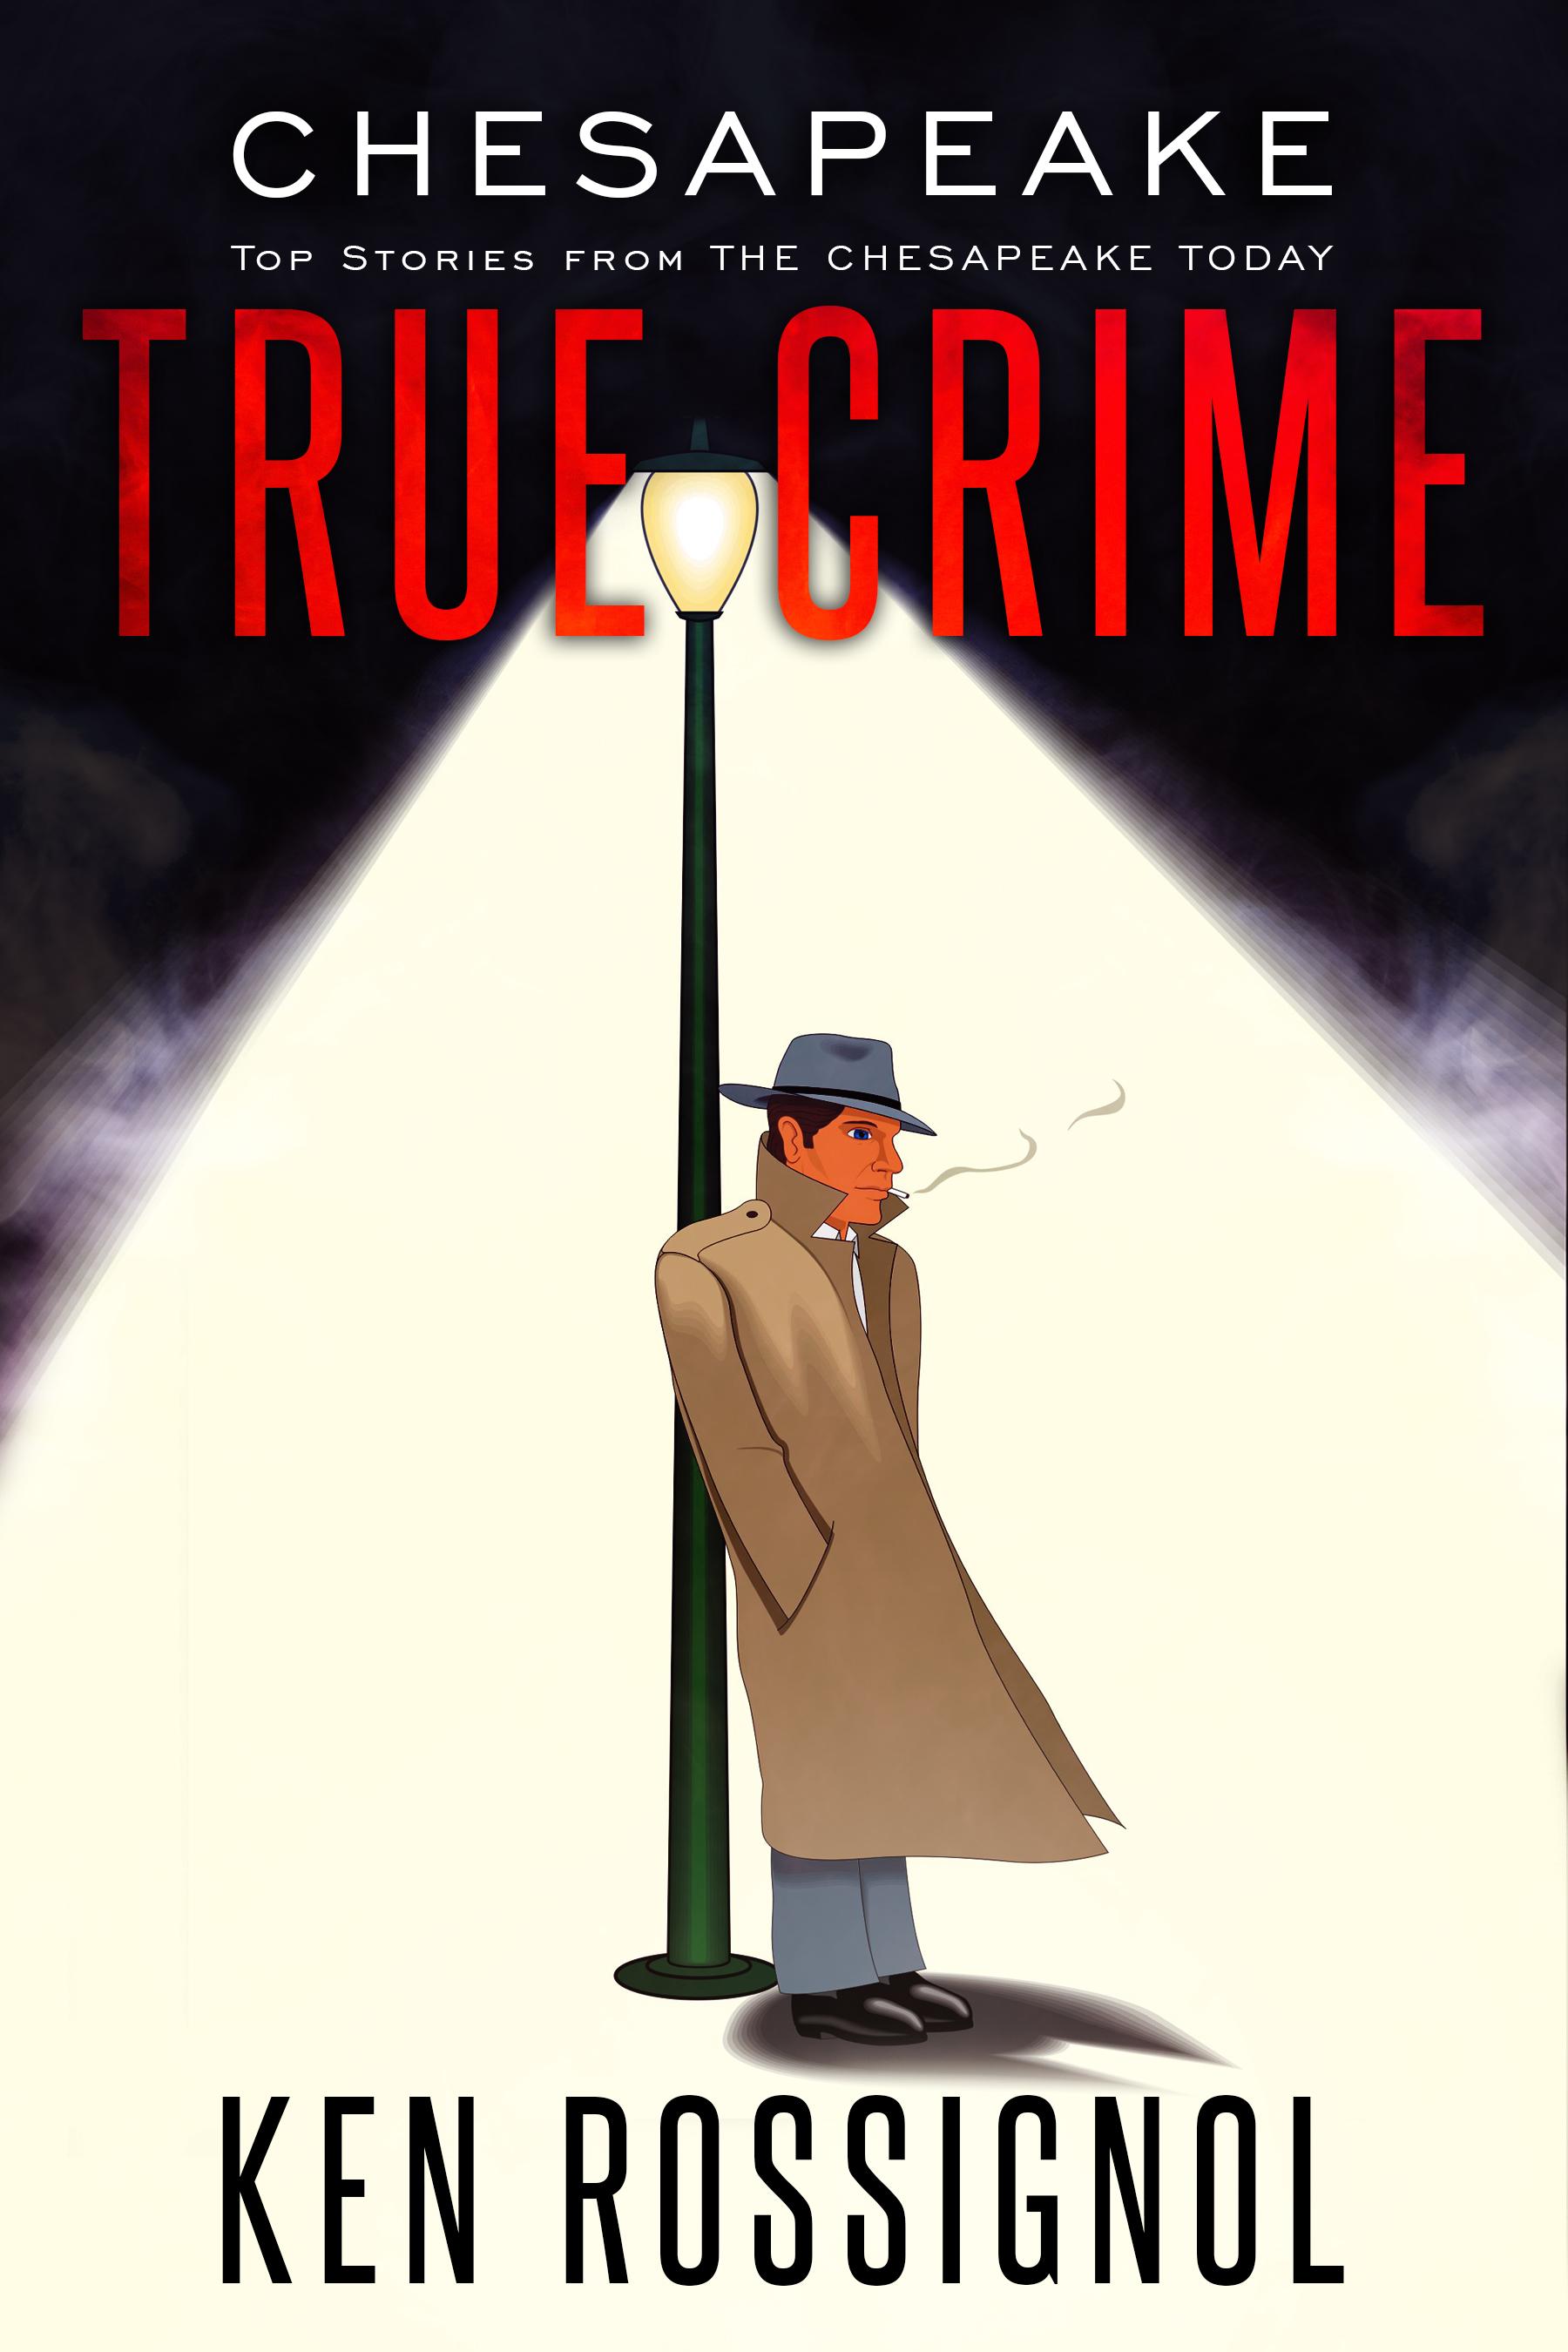 CHESAPEAKE TRUE CRIME